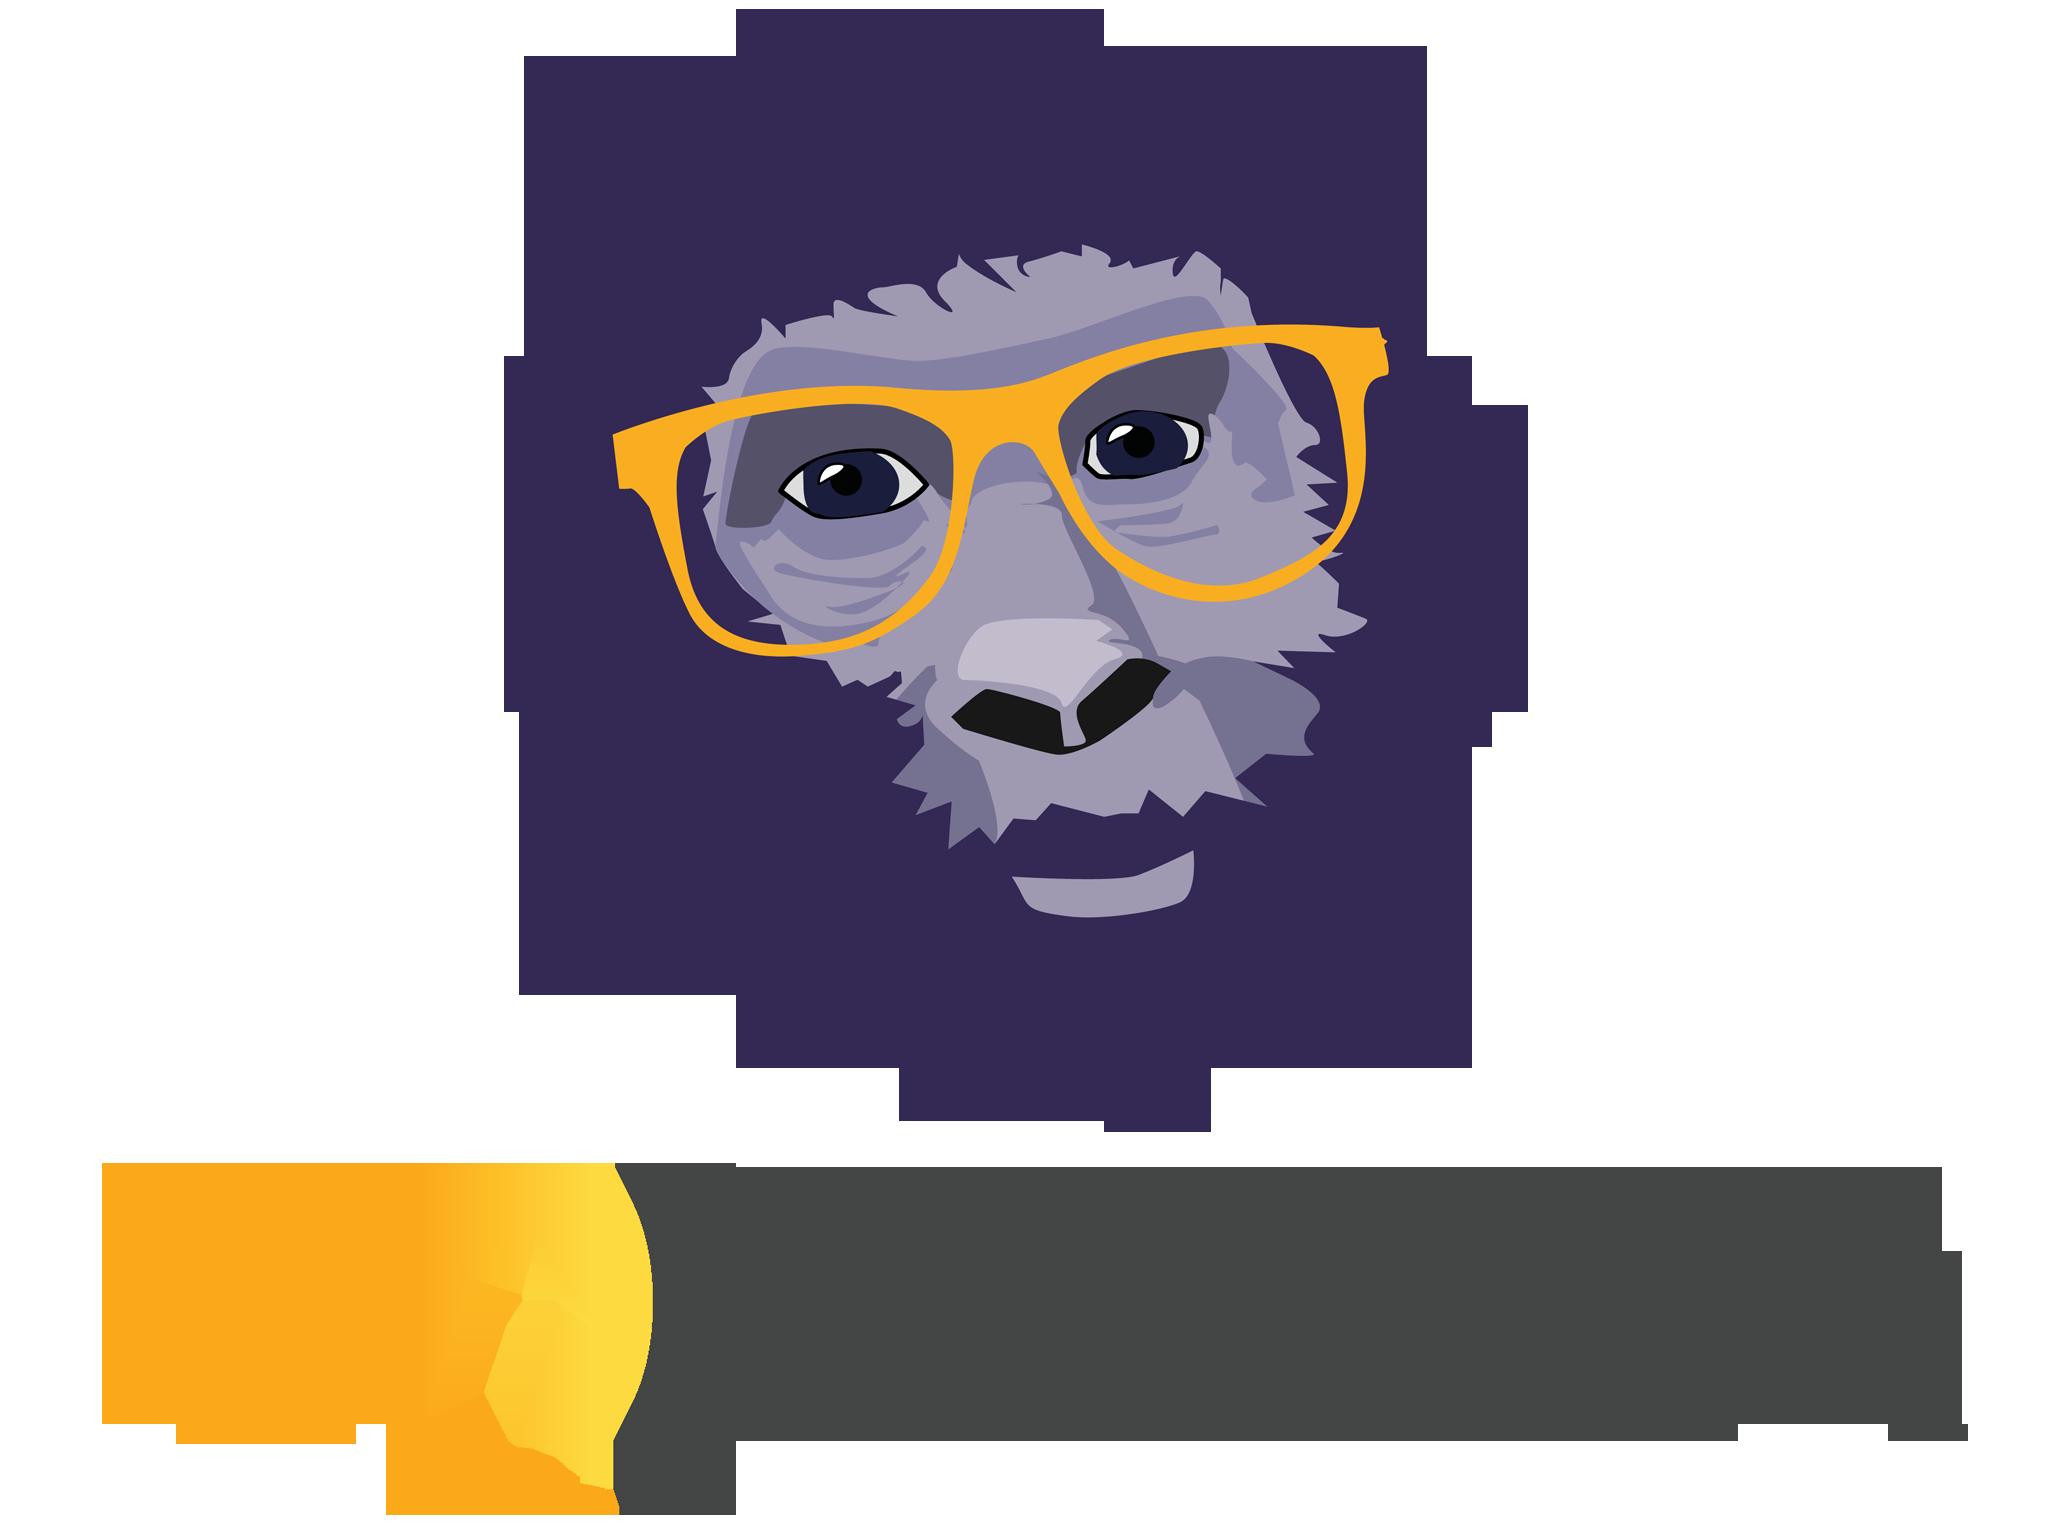 Gobrilla